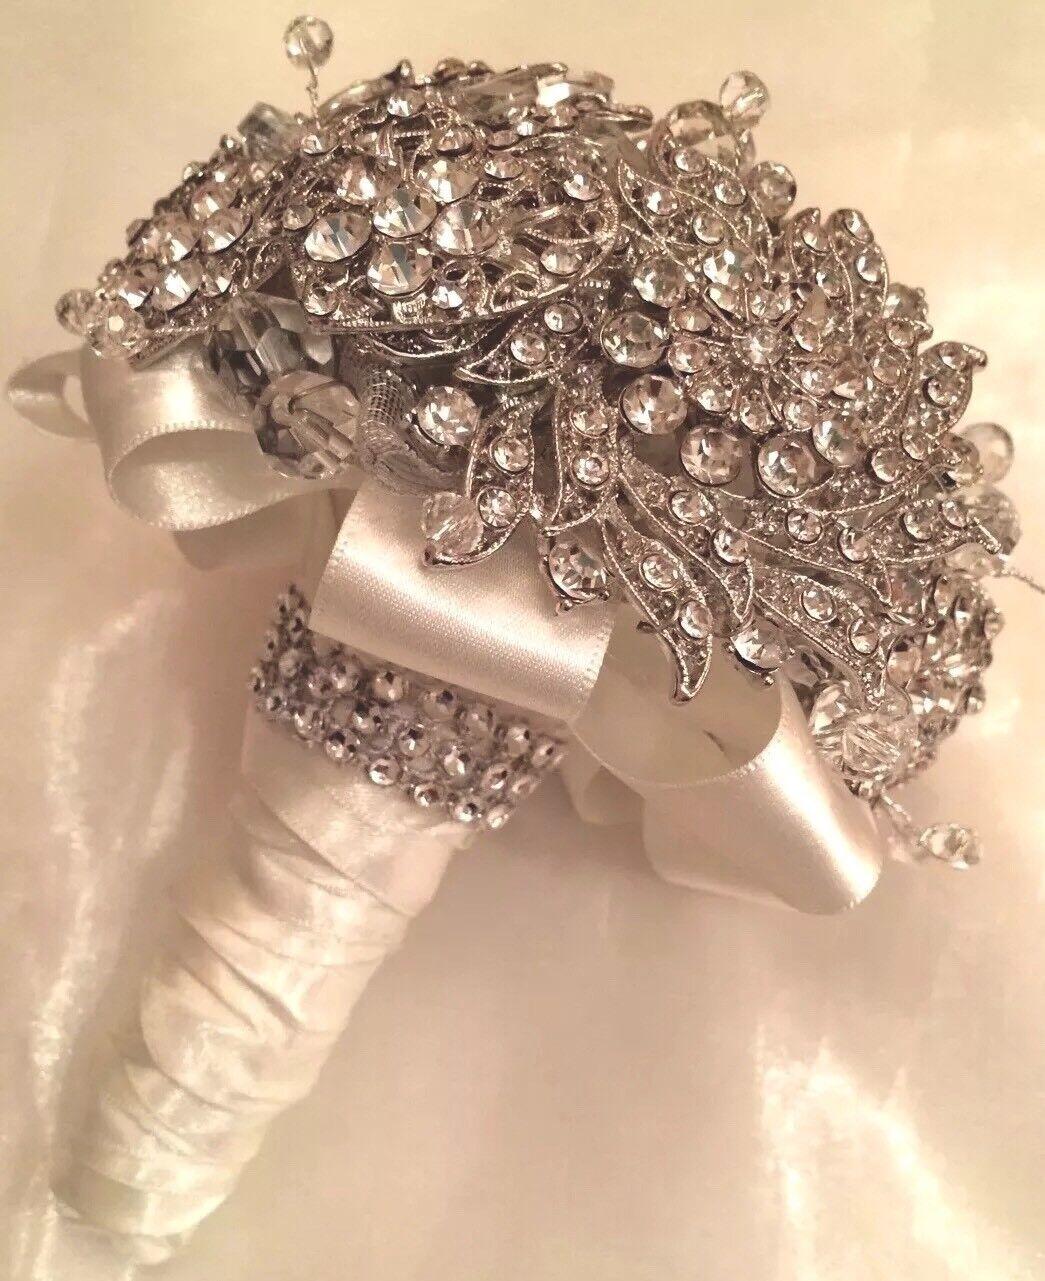 ️ Bridal Diamanté Brooch Bouquet Crystal Beaded Posy And Buttonhole